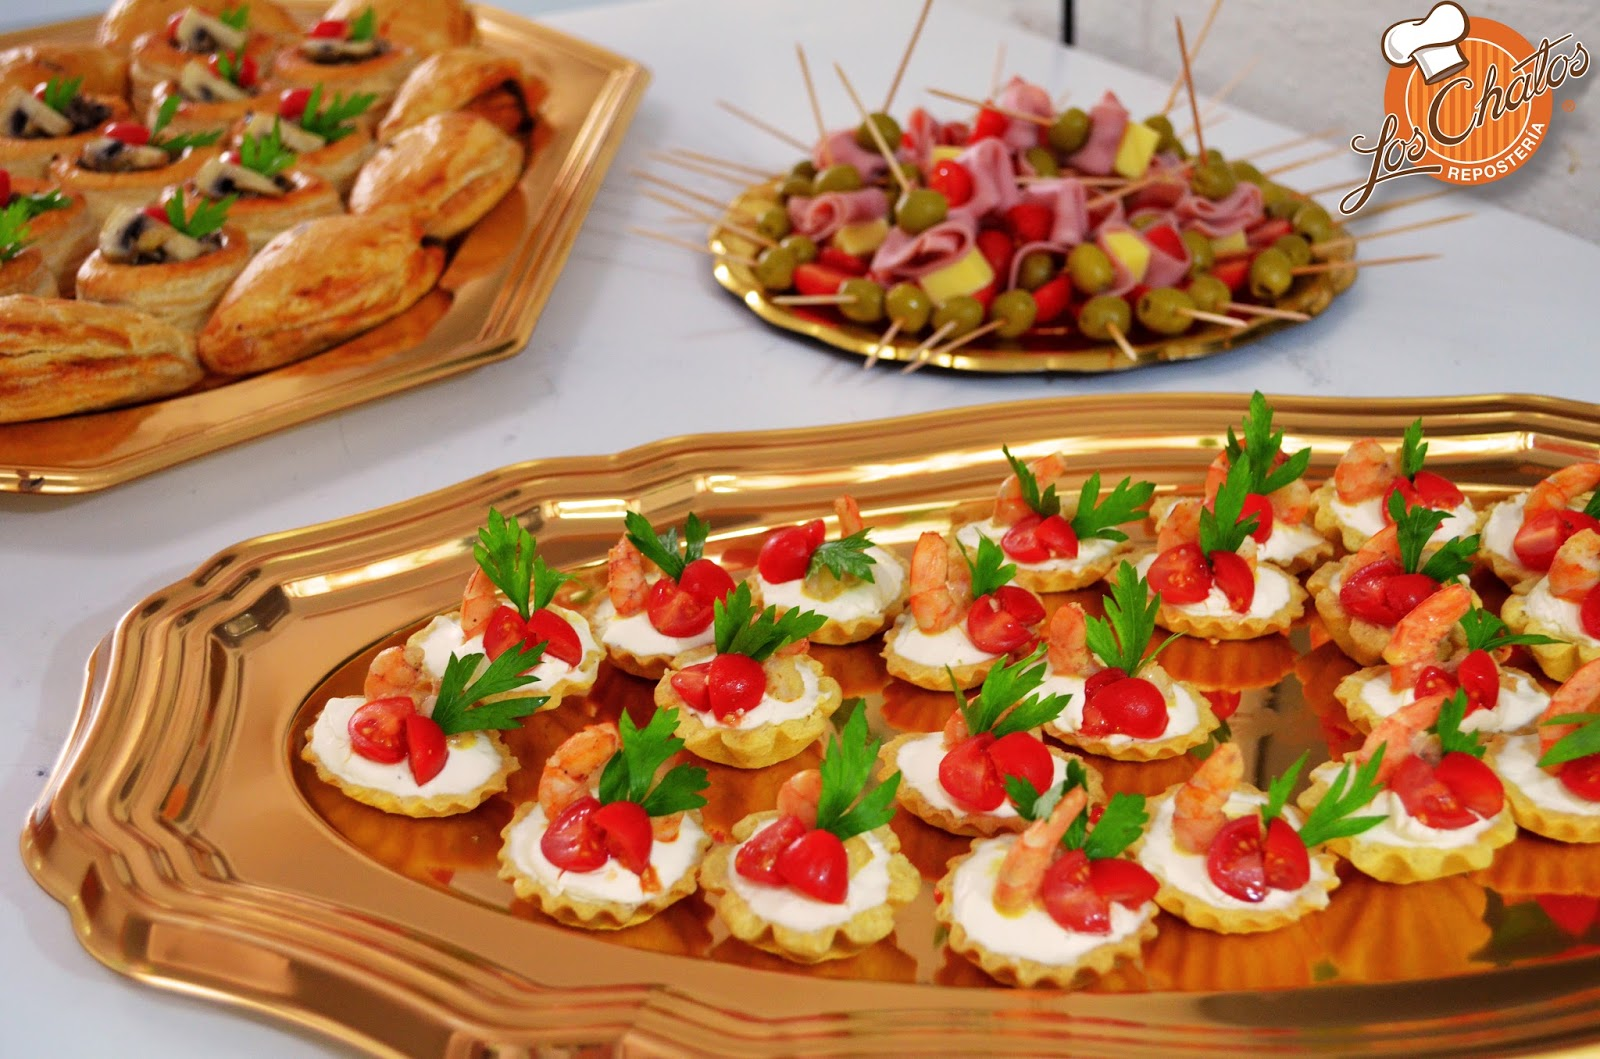 Los chatos mesa de postres el acompa ante perfecto for Mesa salada para cumple